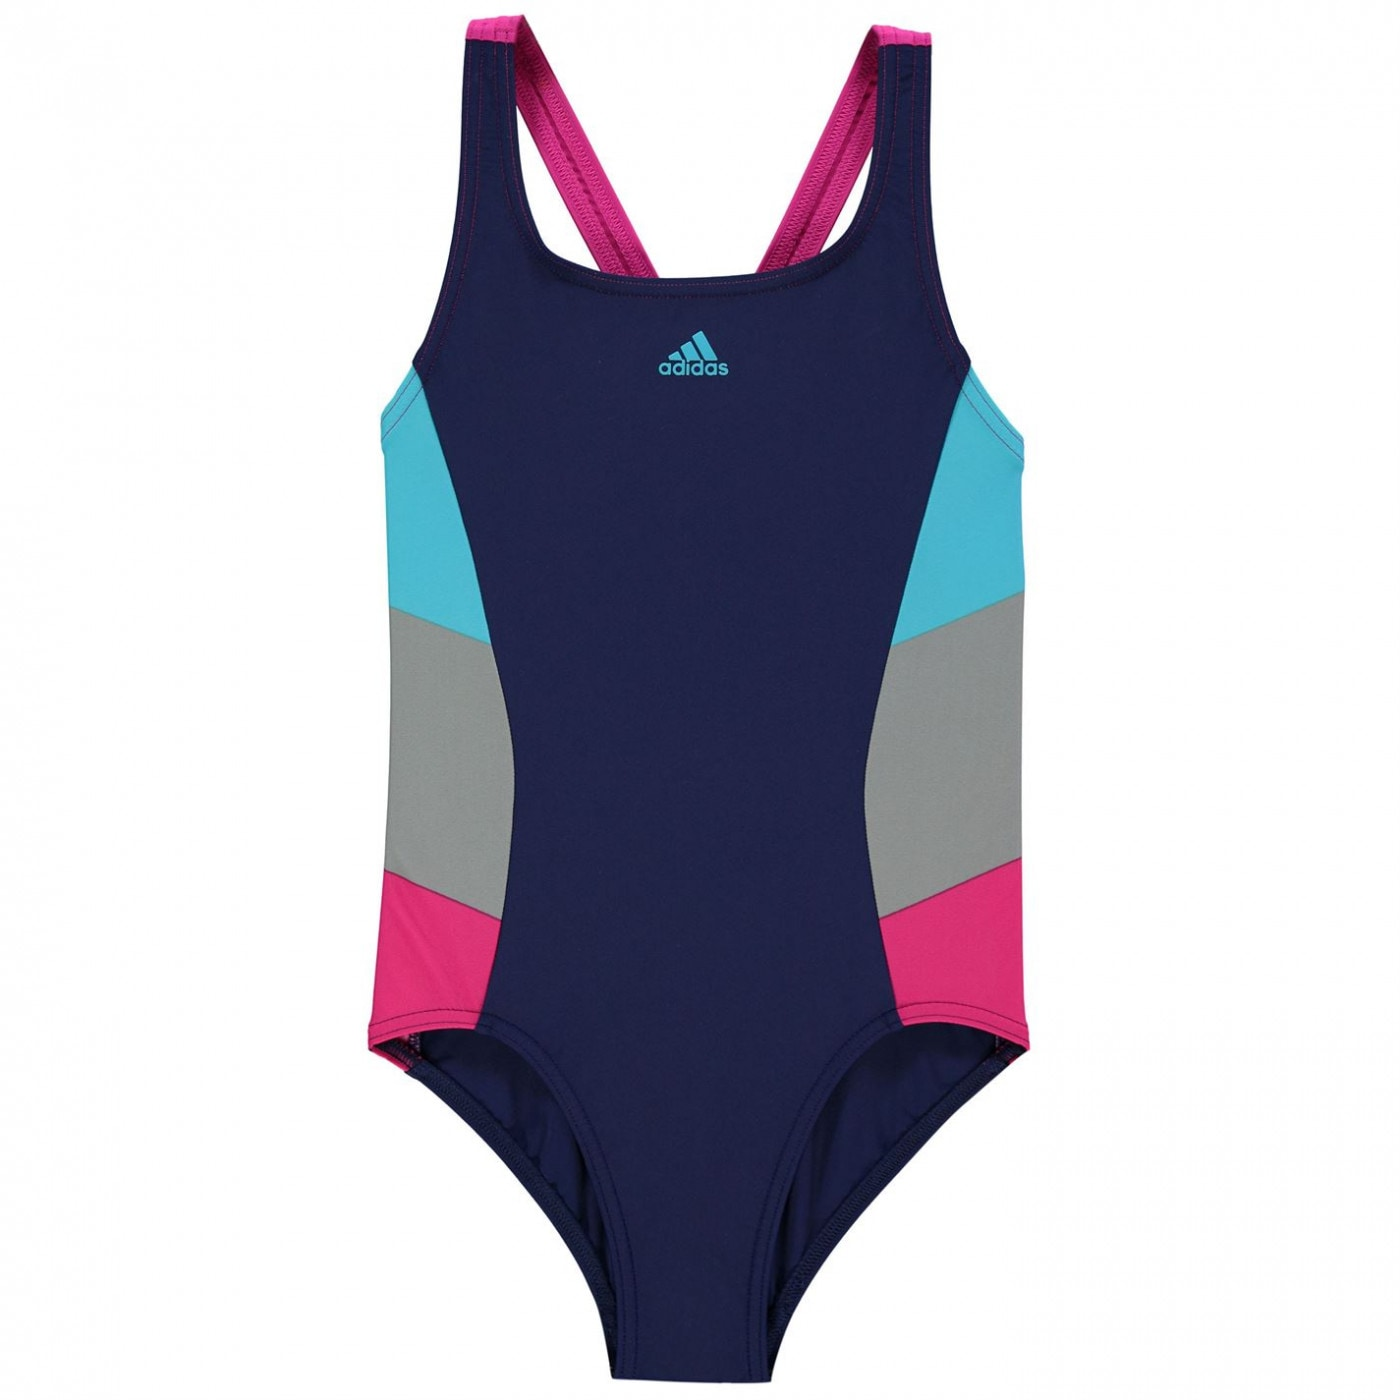 Adidas Fitness Swimsuit Junior Girls